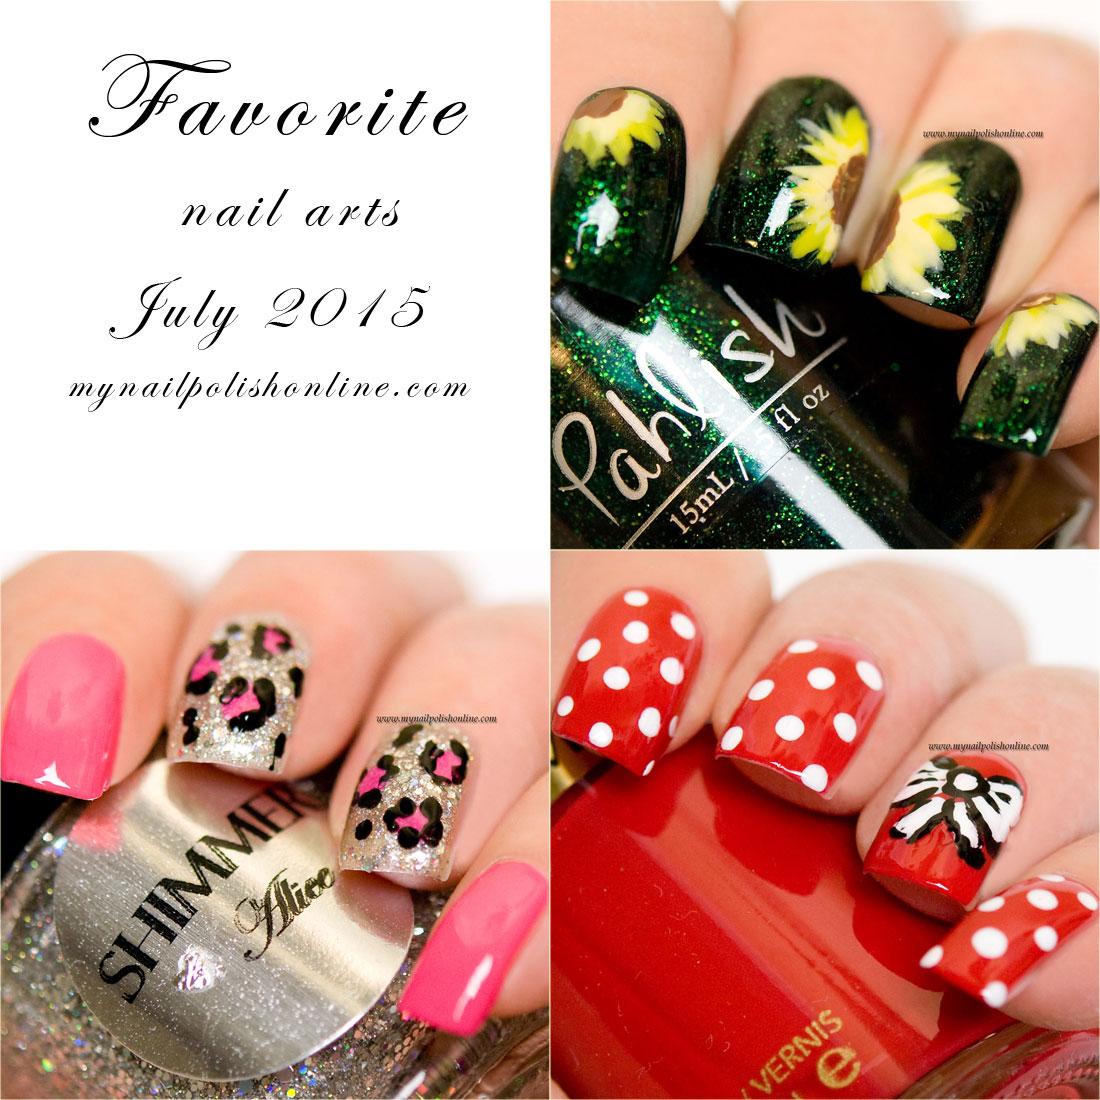 Favorite nail art - July 2015